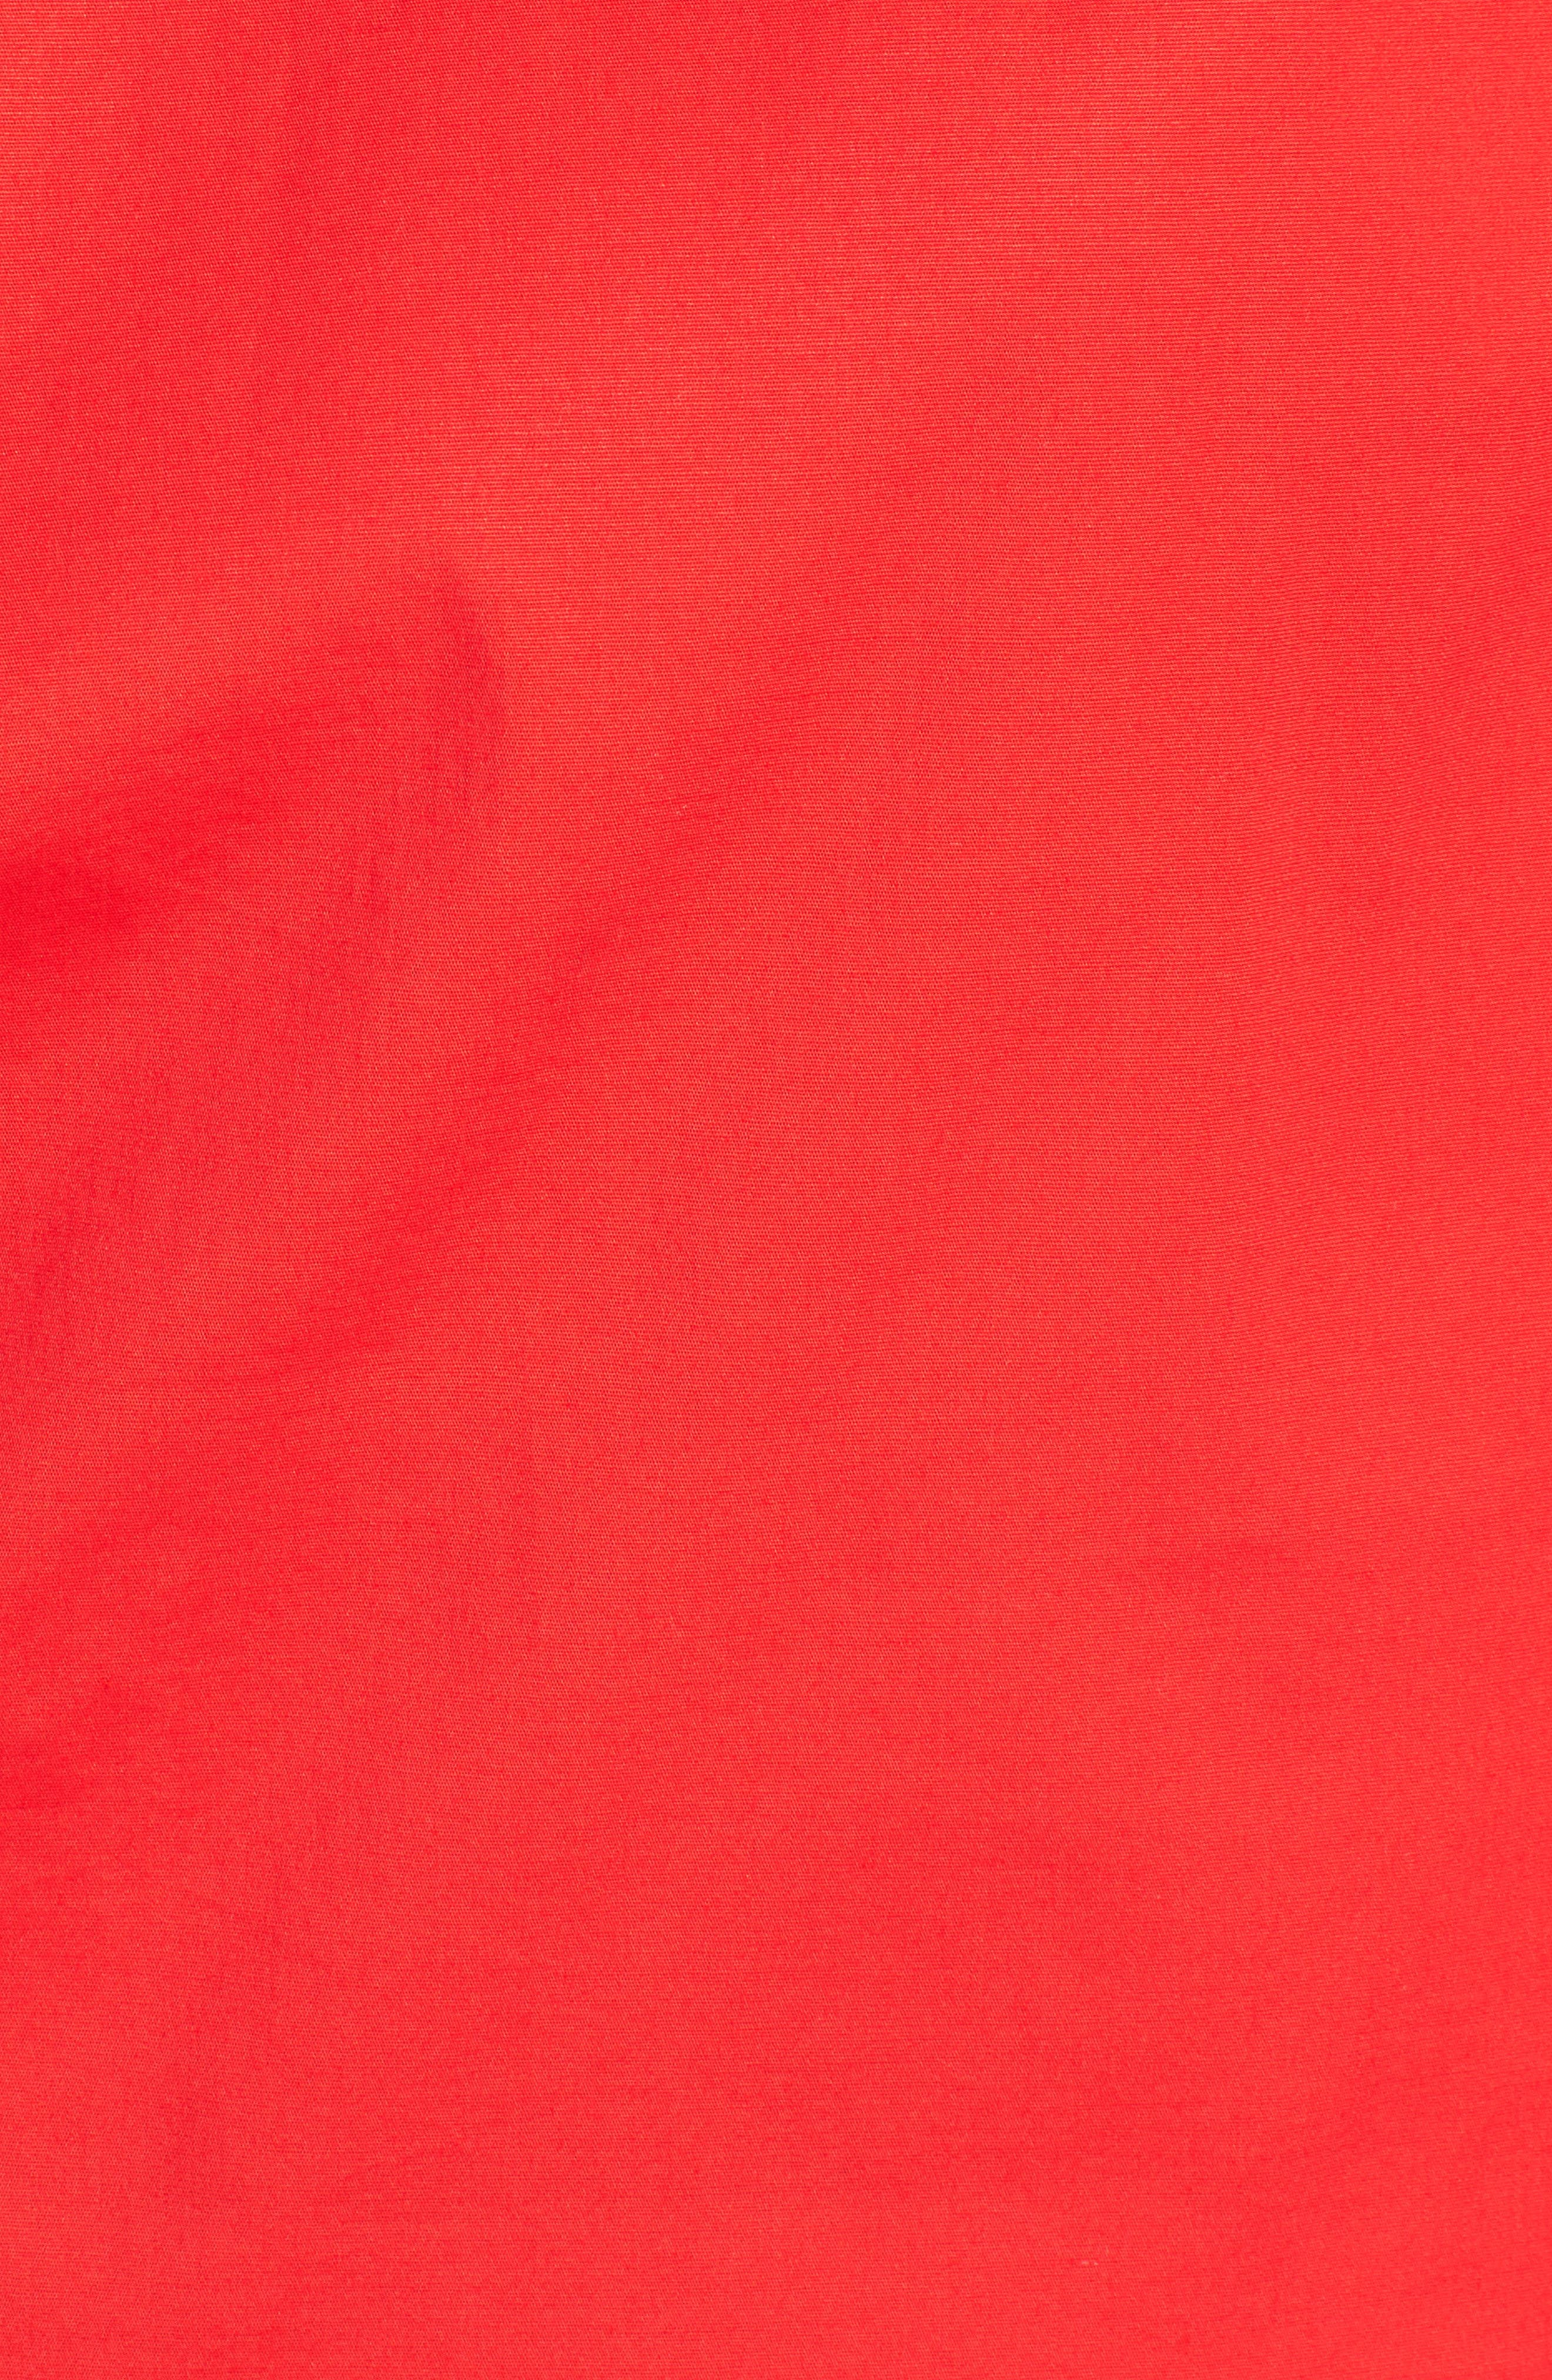 Leah Blouson Sleeve Top,                             Alternate thumbnail 6, color,                             Fiery Red